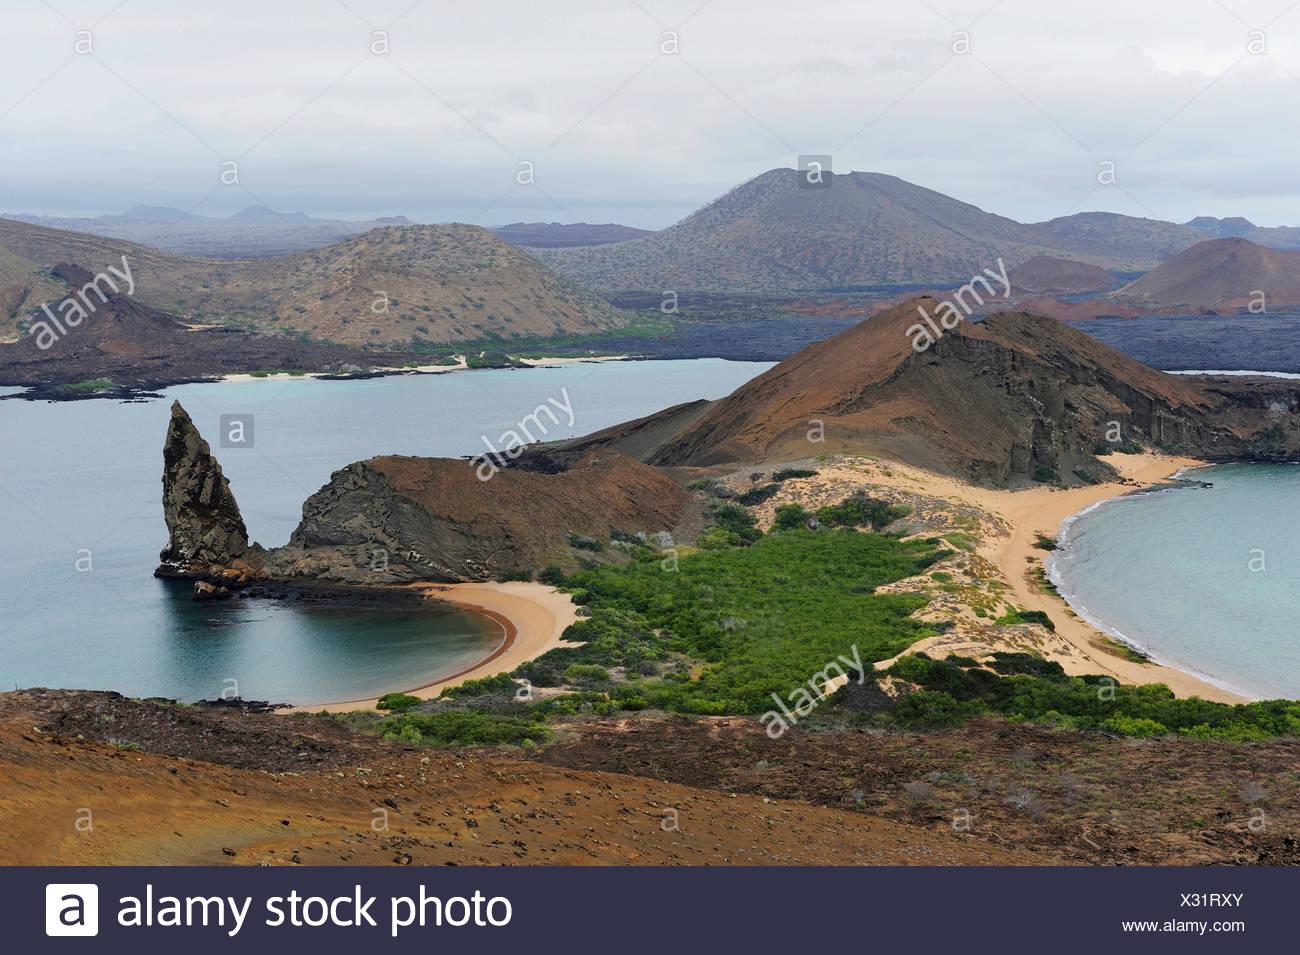 Sullivan Bay and Pinnacle Rock, Bartolom Island, Galapagos Islands, Ecuador, South America Stock Photo